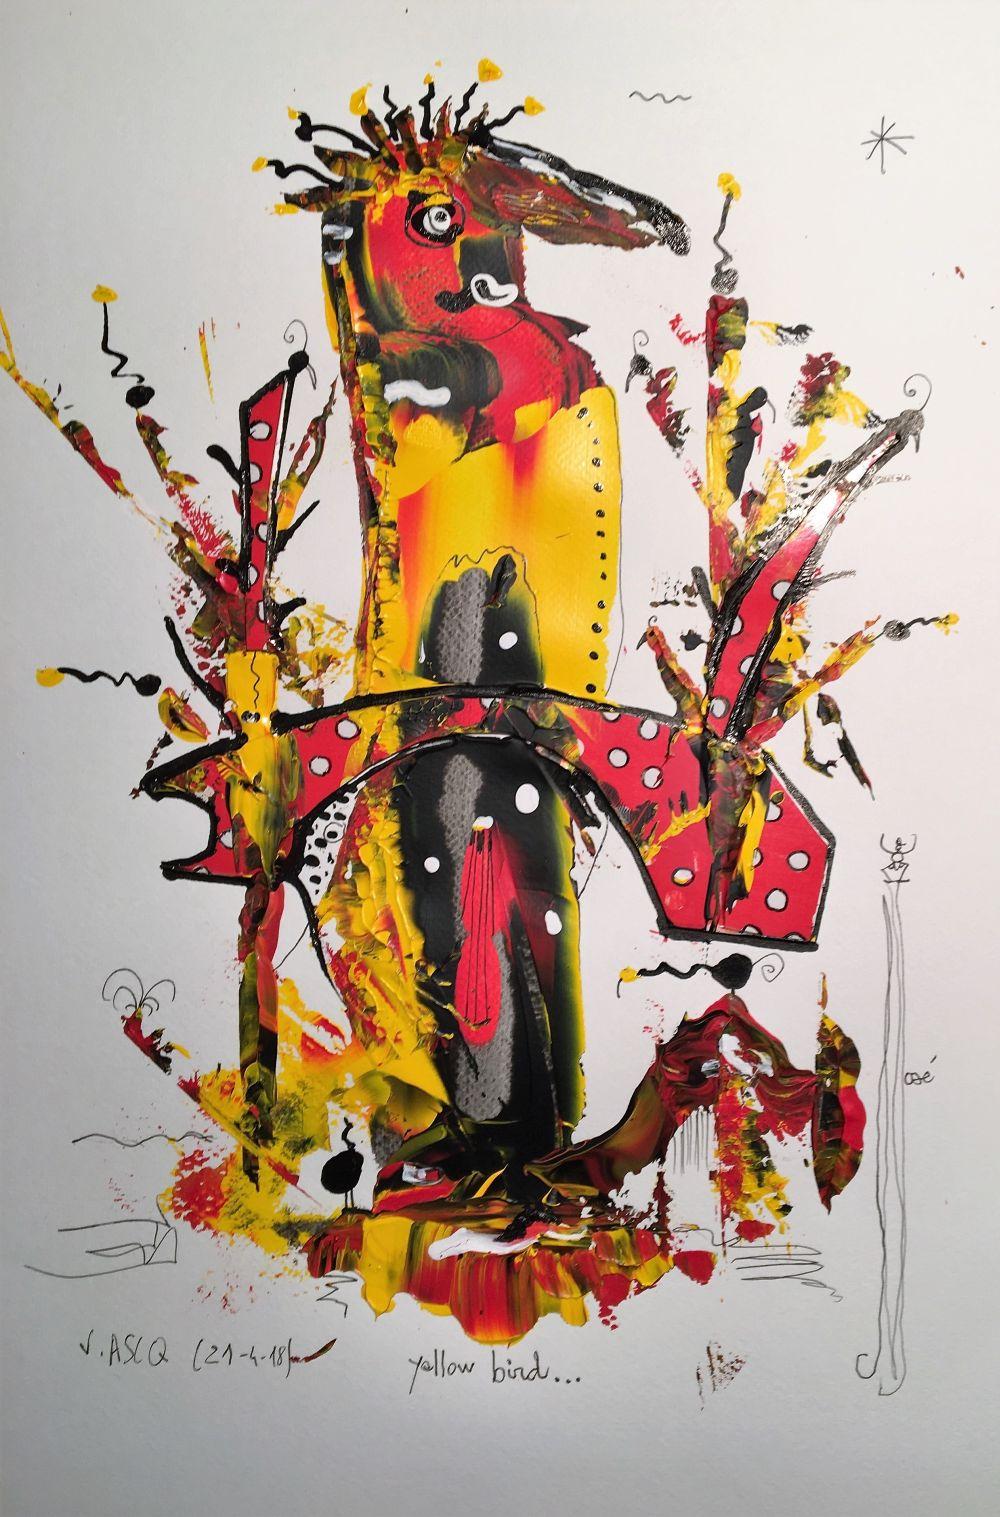 yellow bird R